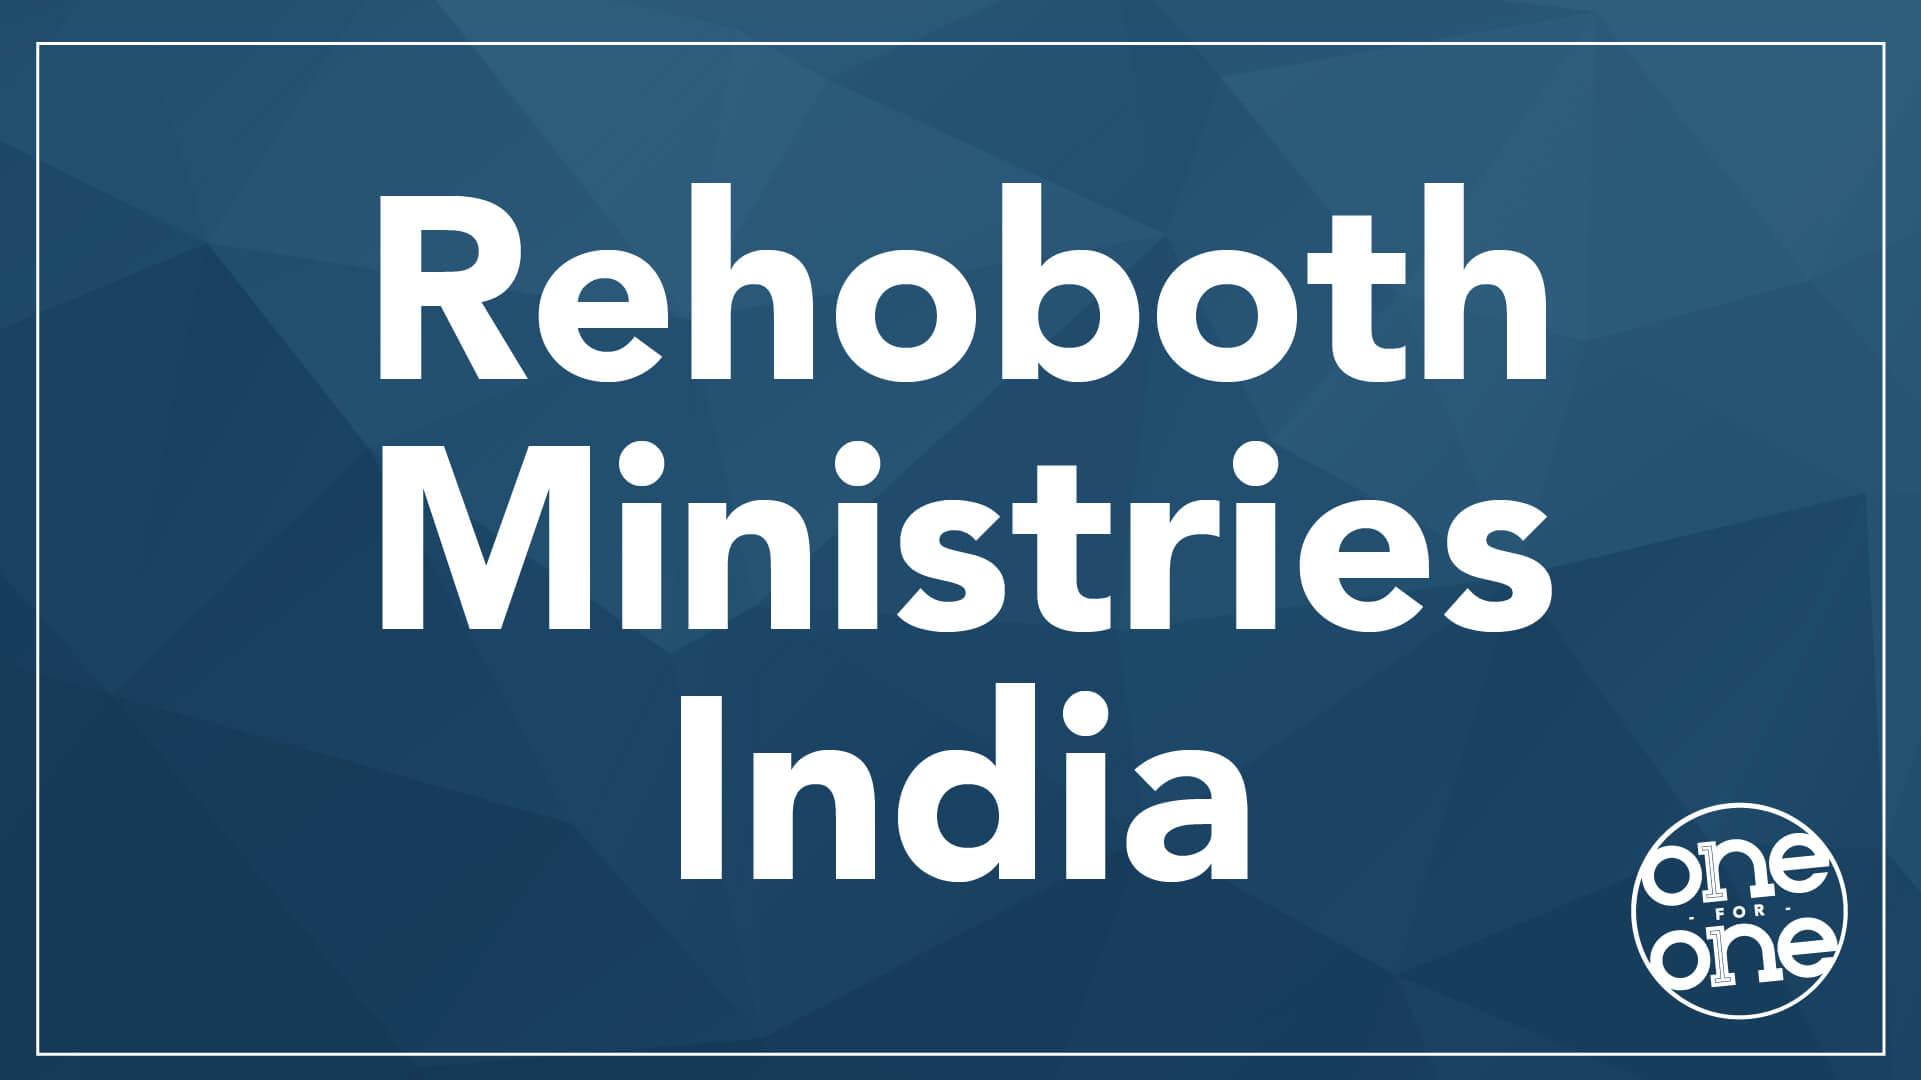 OFO - Rehoboth Ministries Slide